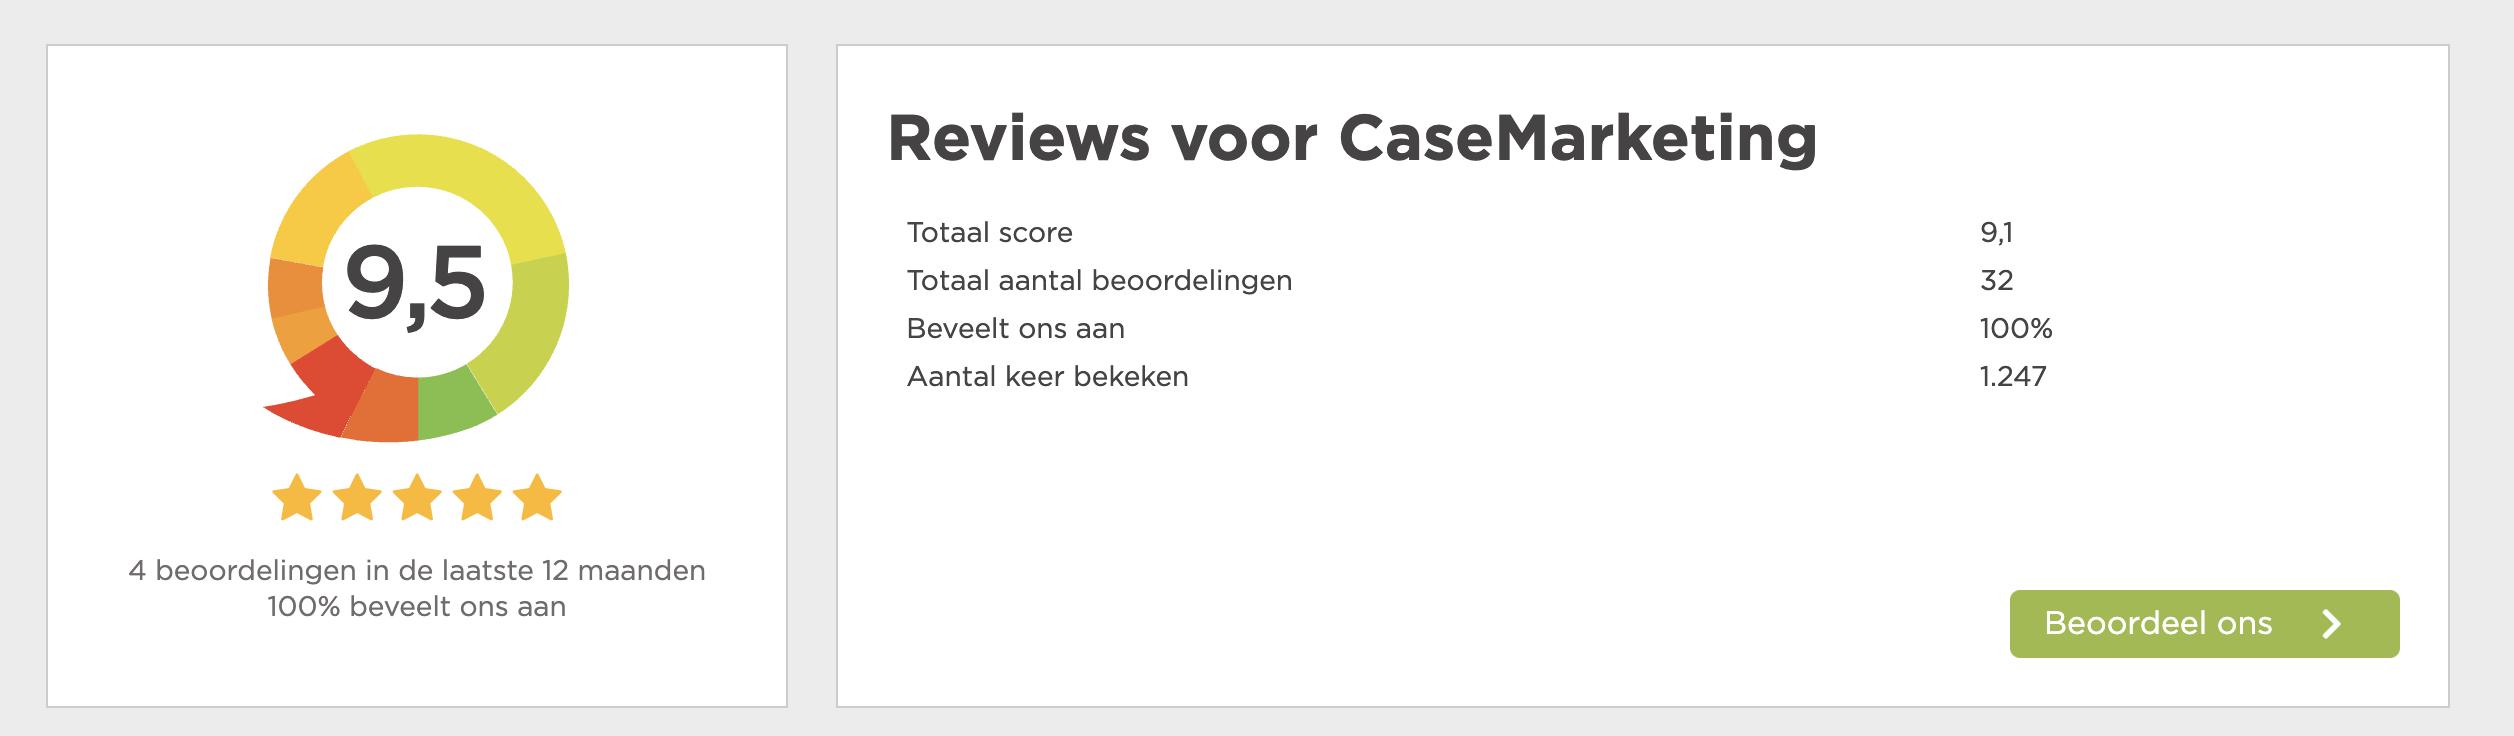 Klantenvertellen reviews en ervaringen CaseMarketing